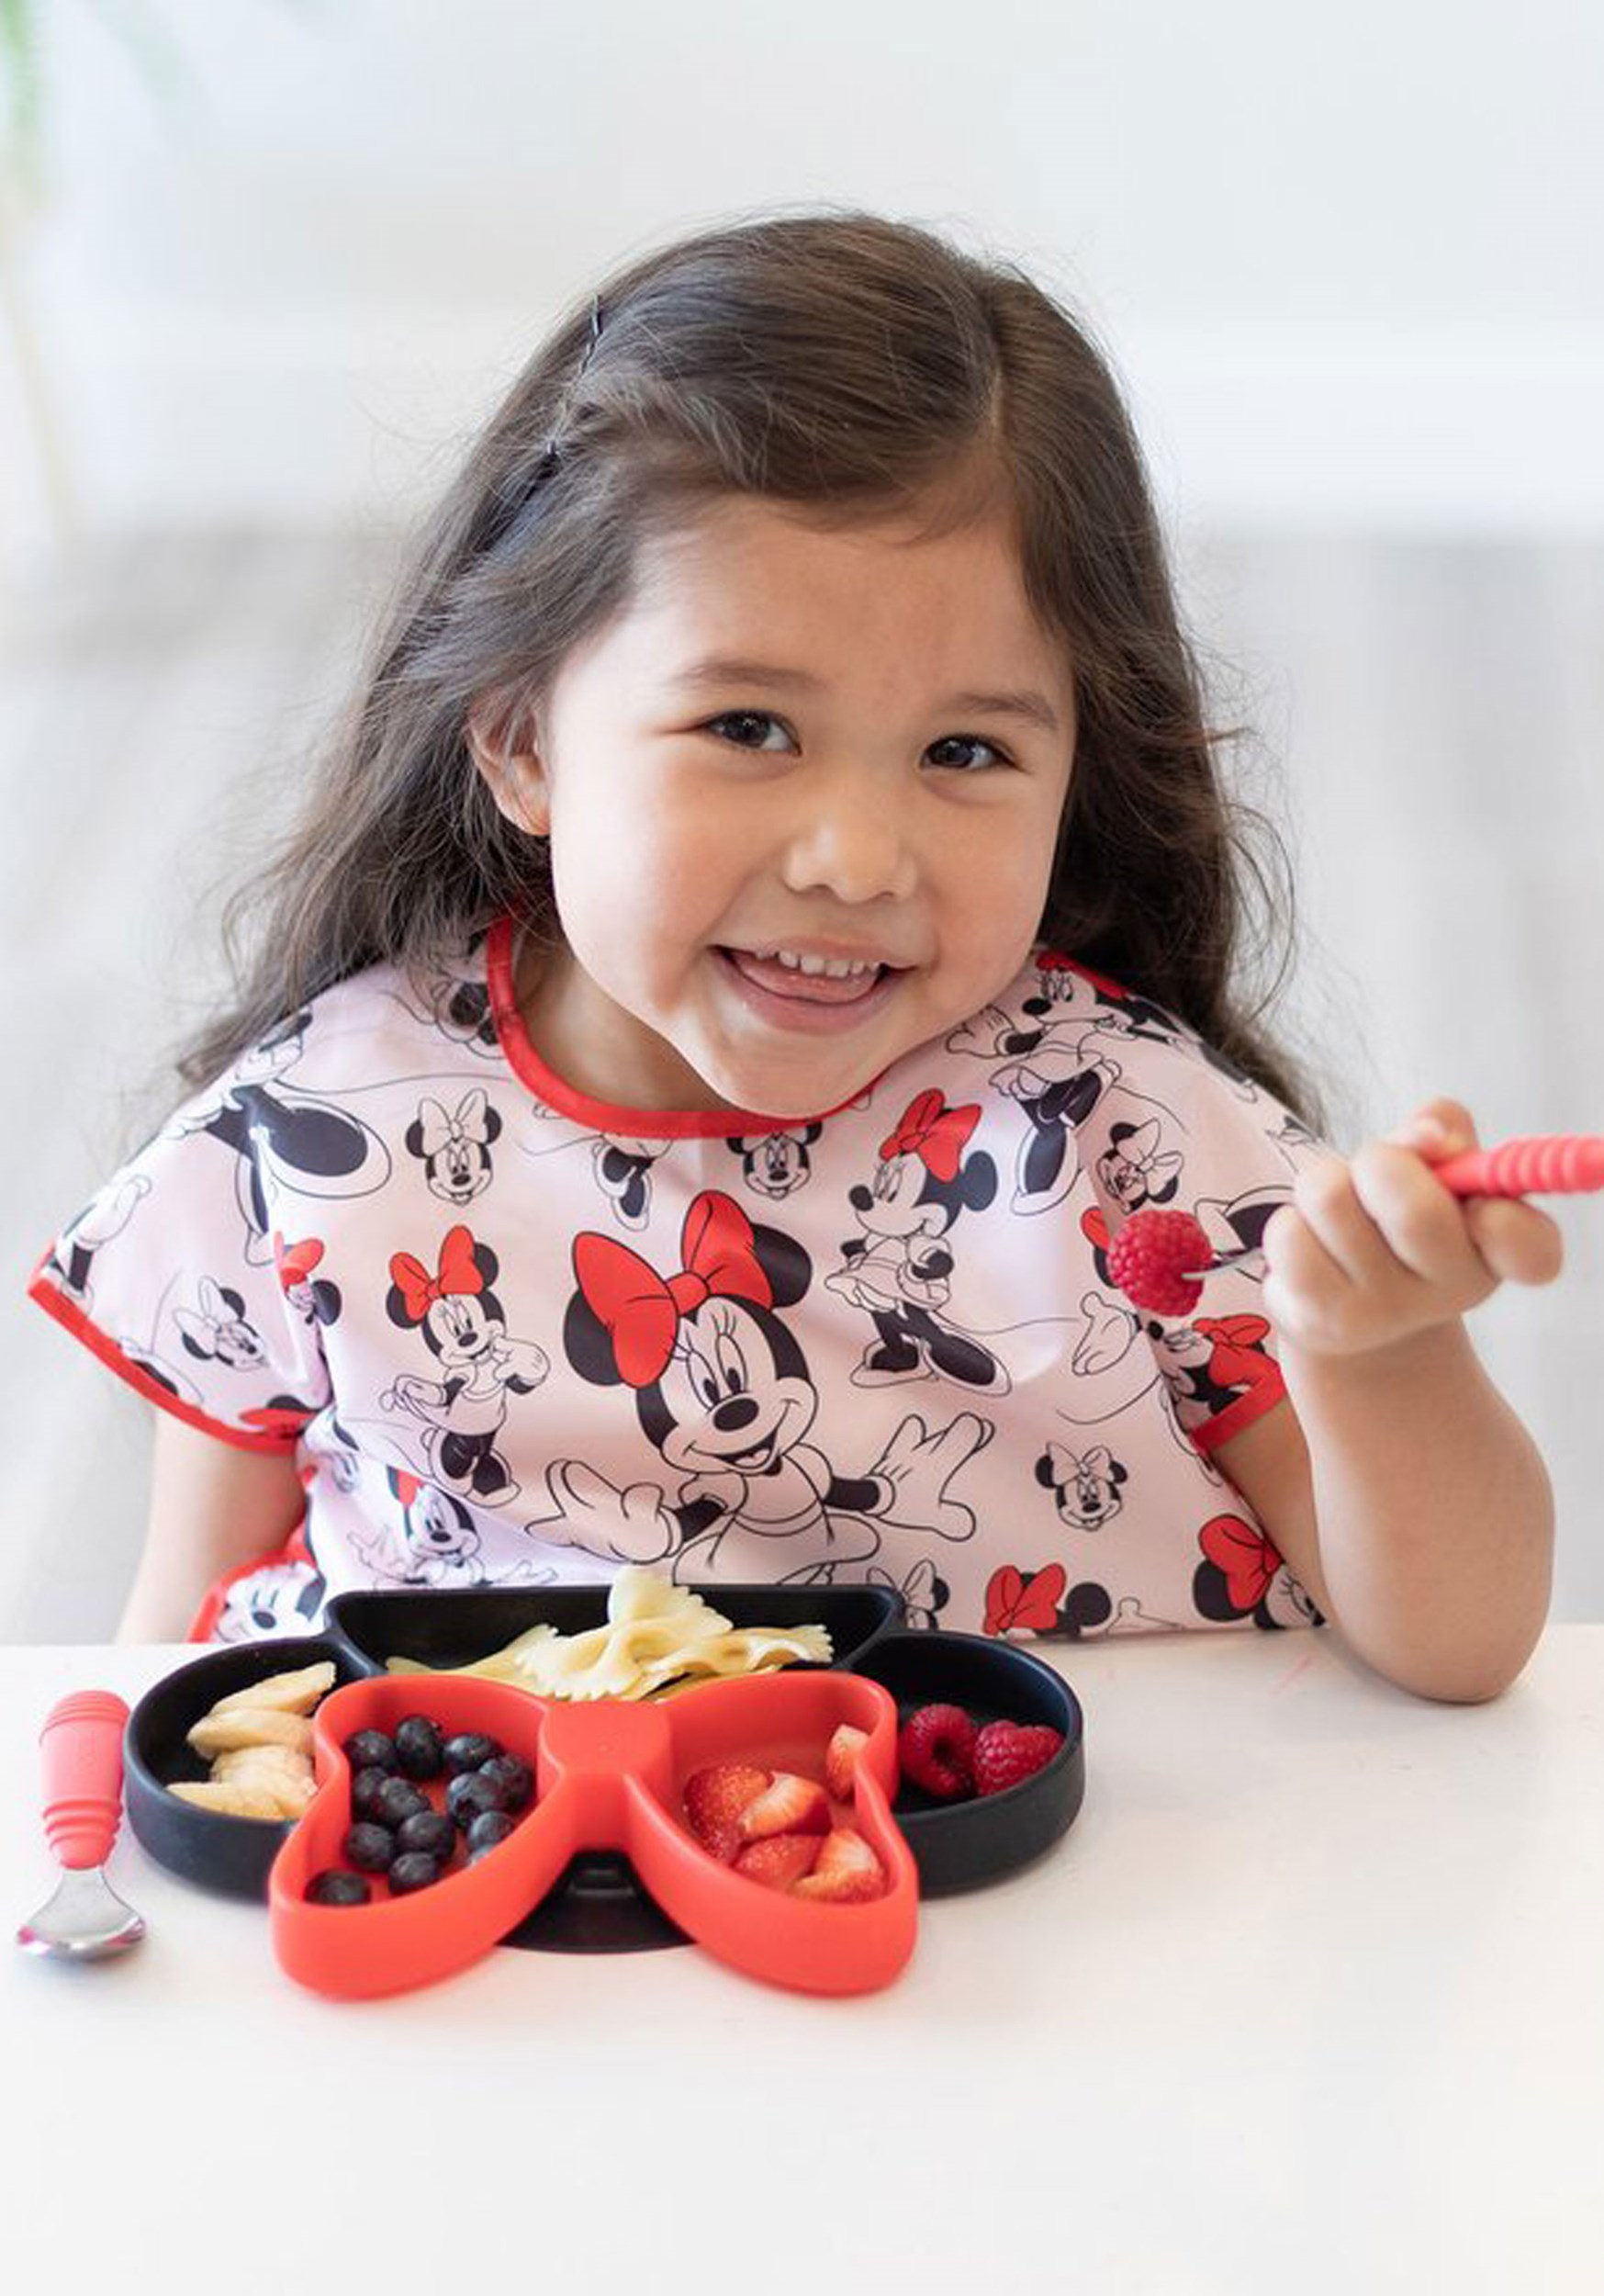 Disney Minnie Mouse Classic Juniors Bib (1-3 years)